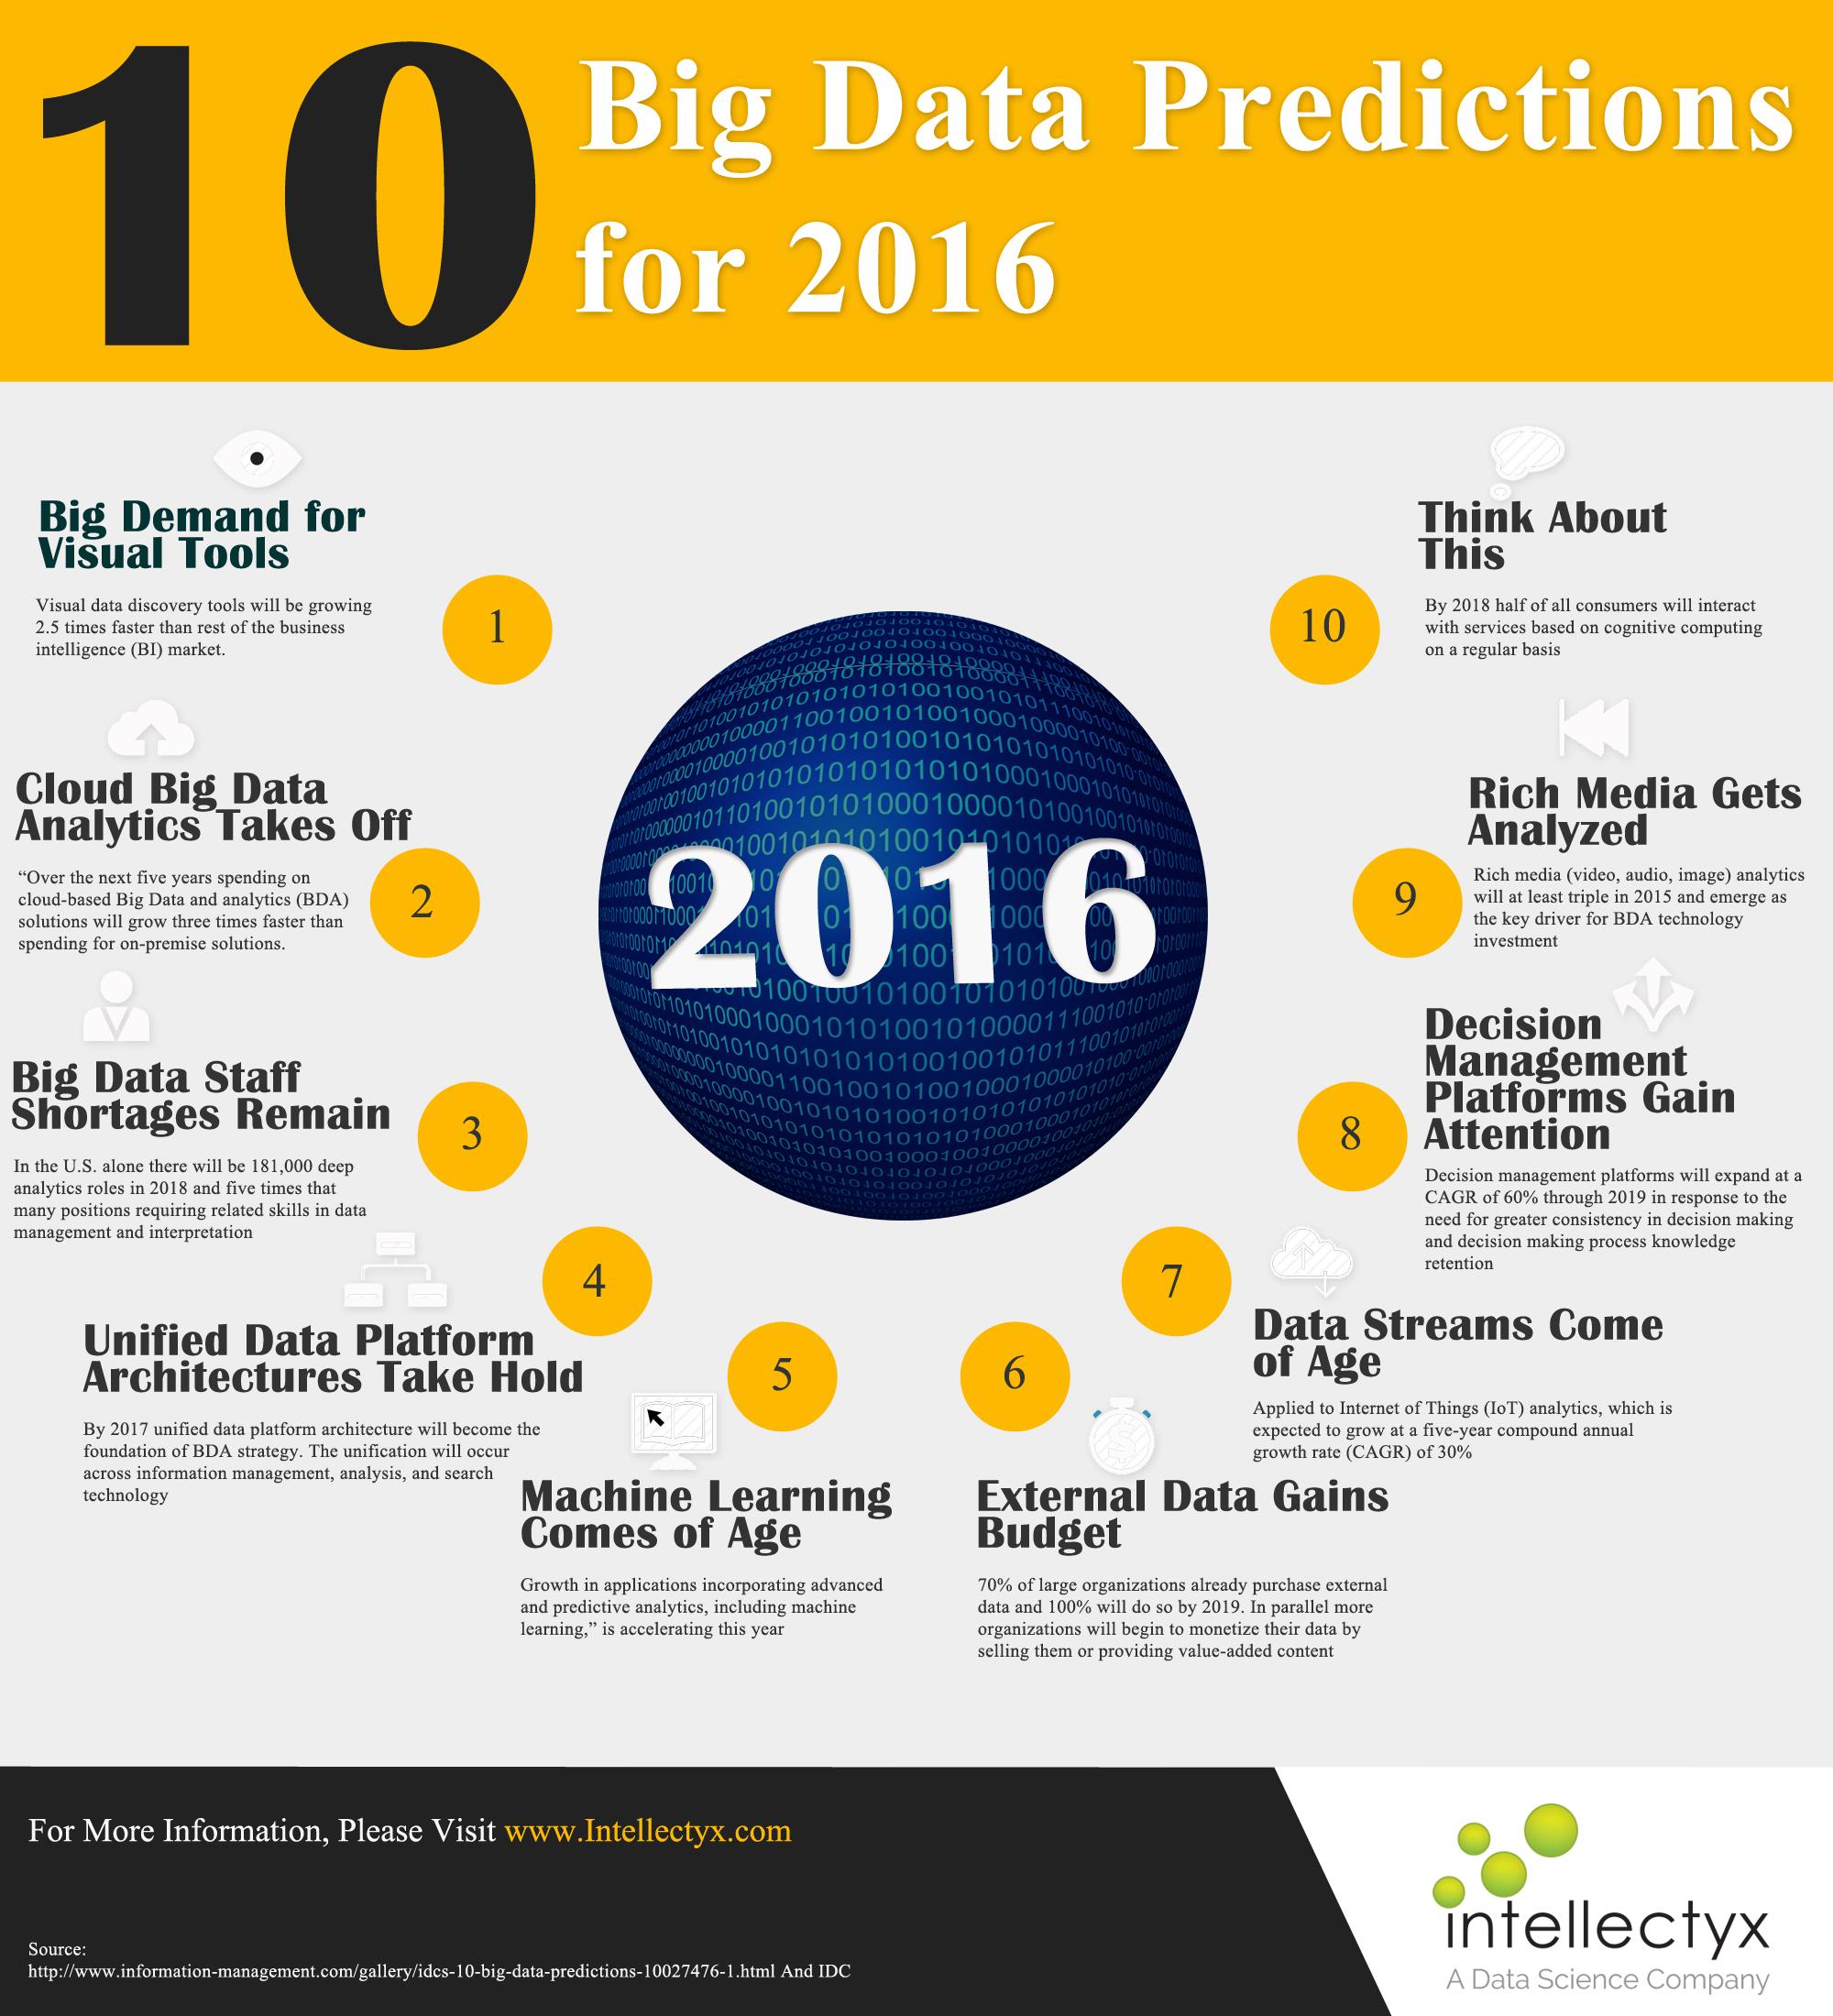 10 Big Data Predictions for 2016